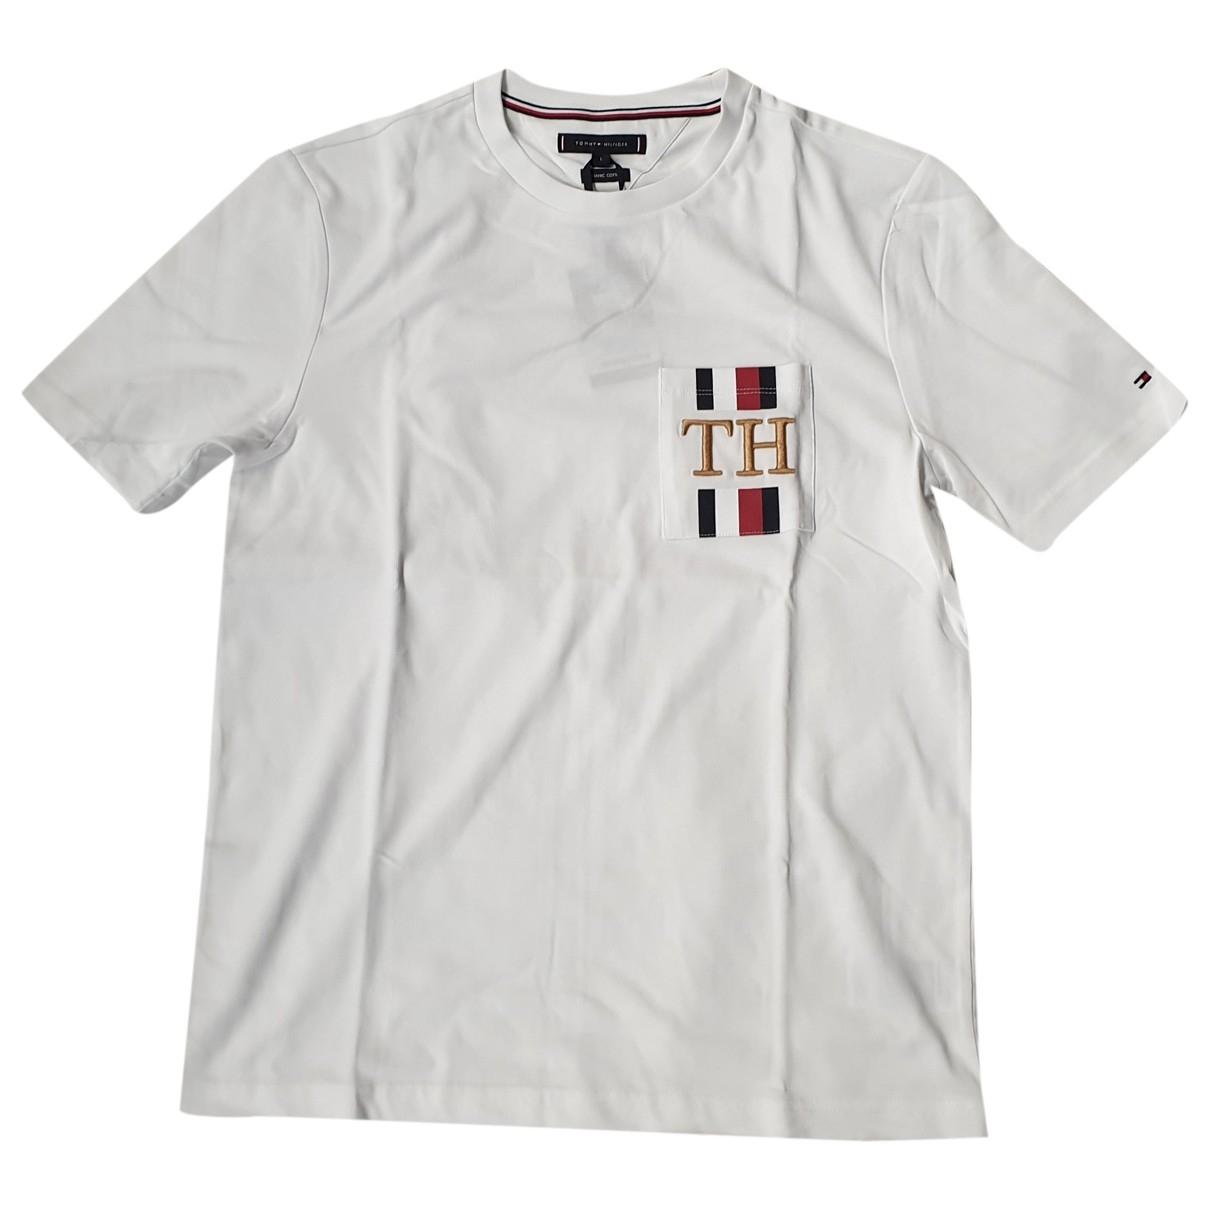 Tommy Hilfiger \N White Cotton T-shirts for Men L International